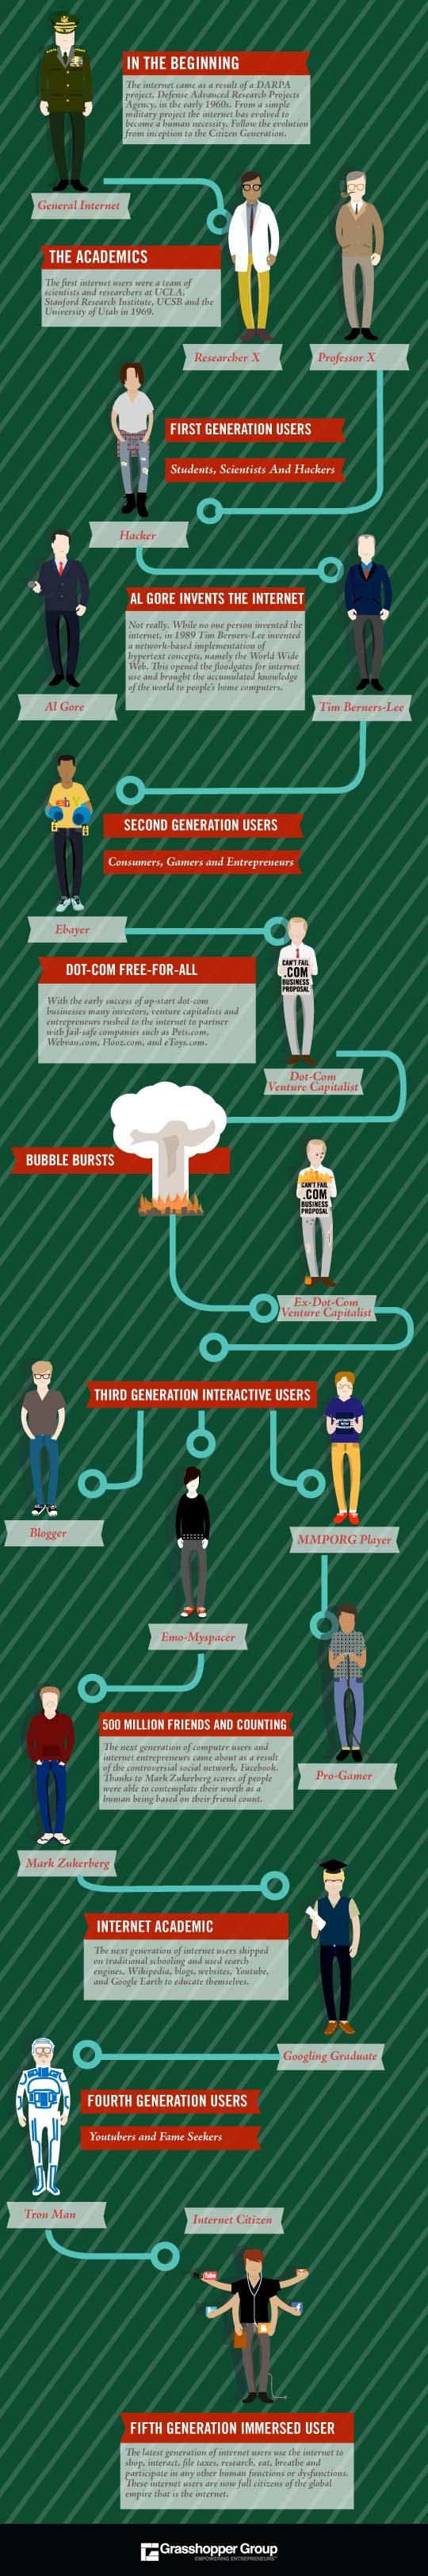 Evolution de l'internet